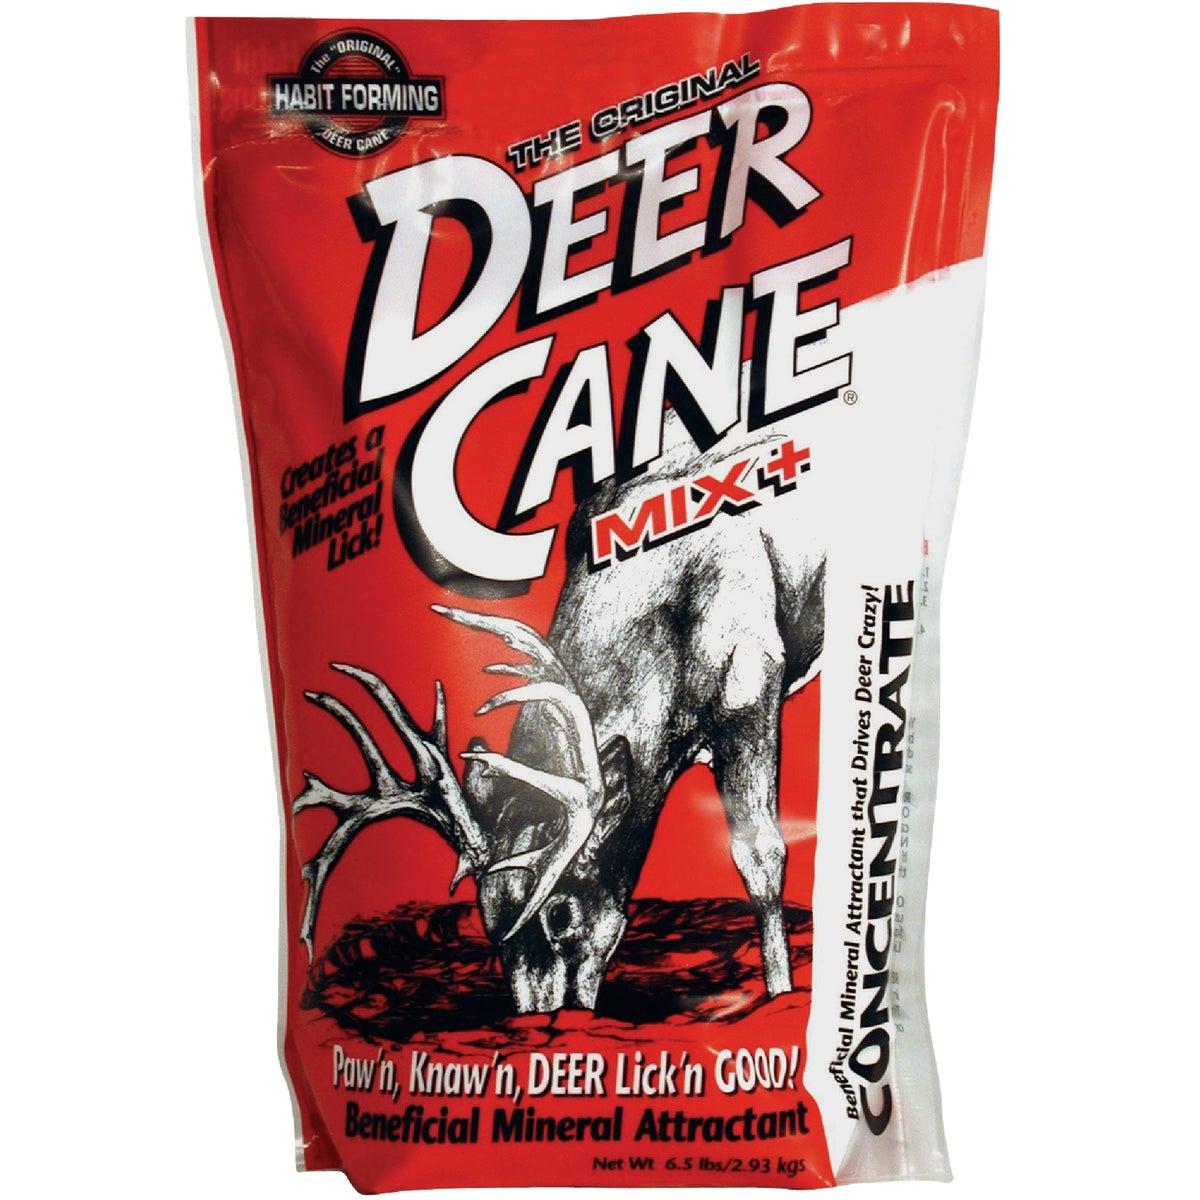 6.5LB DEER CANE MIX